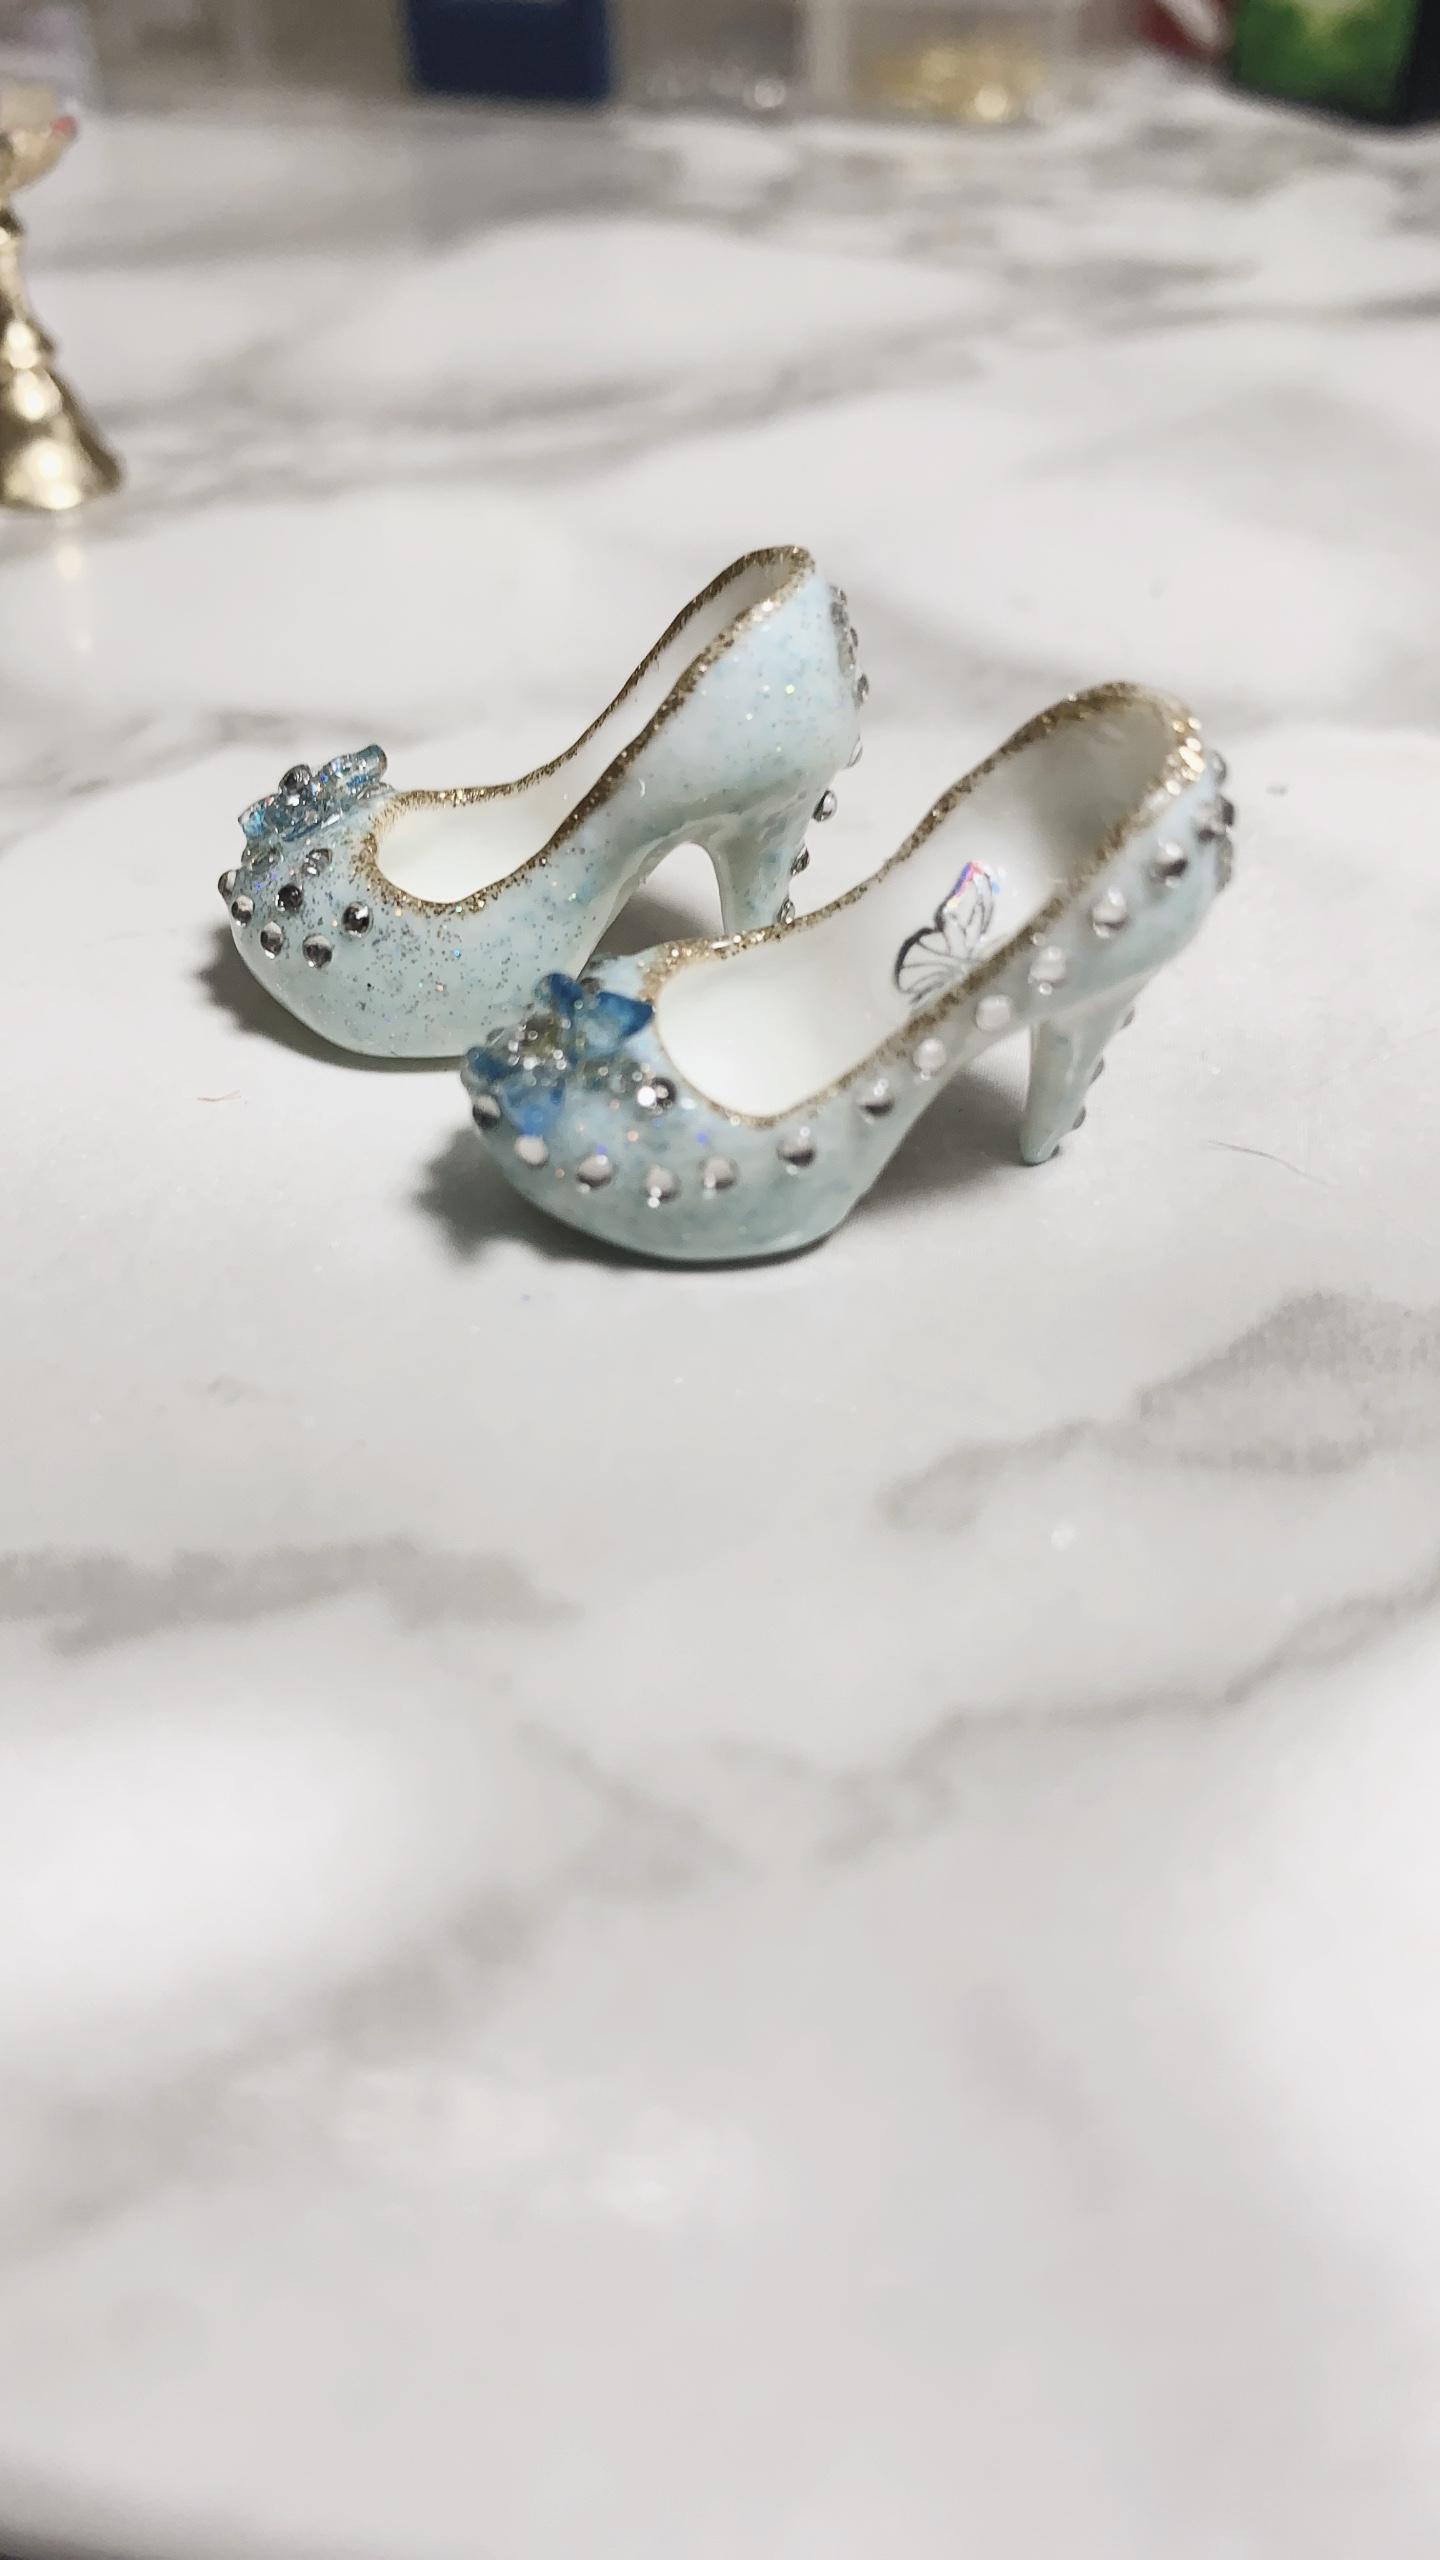 BJD Baby Shoes 6 points baby high heels flat feet can wear small cloth blue high heels az6 points